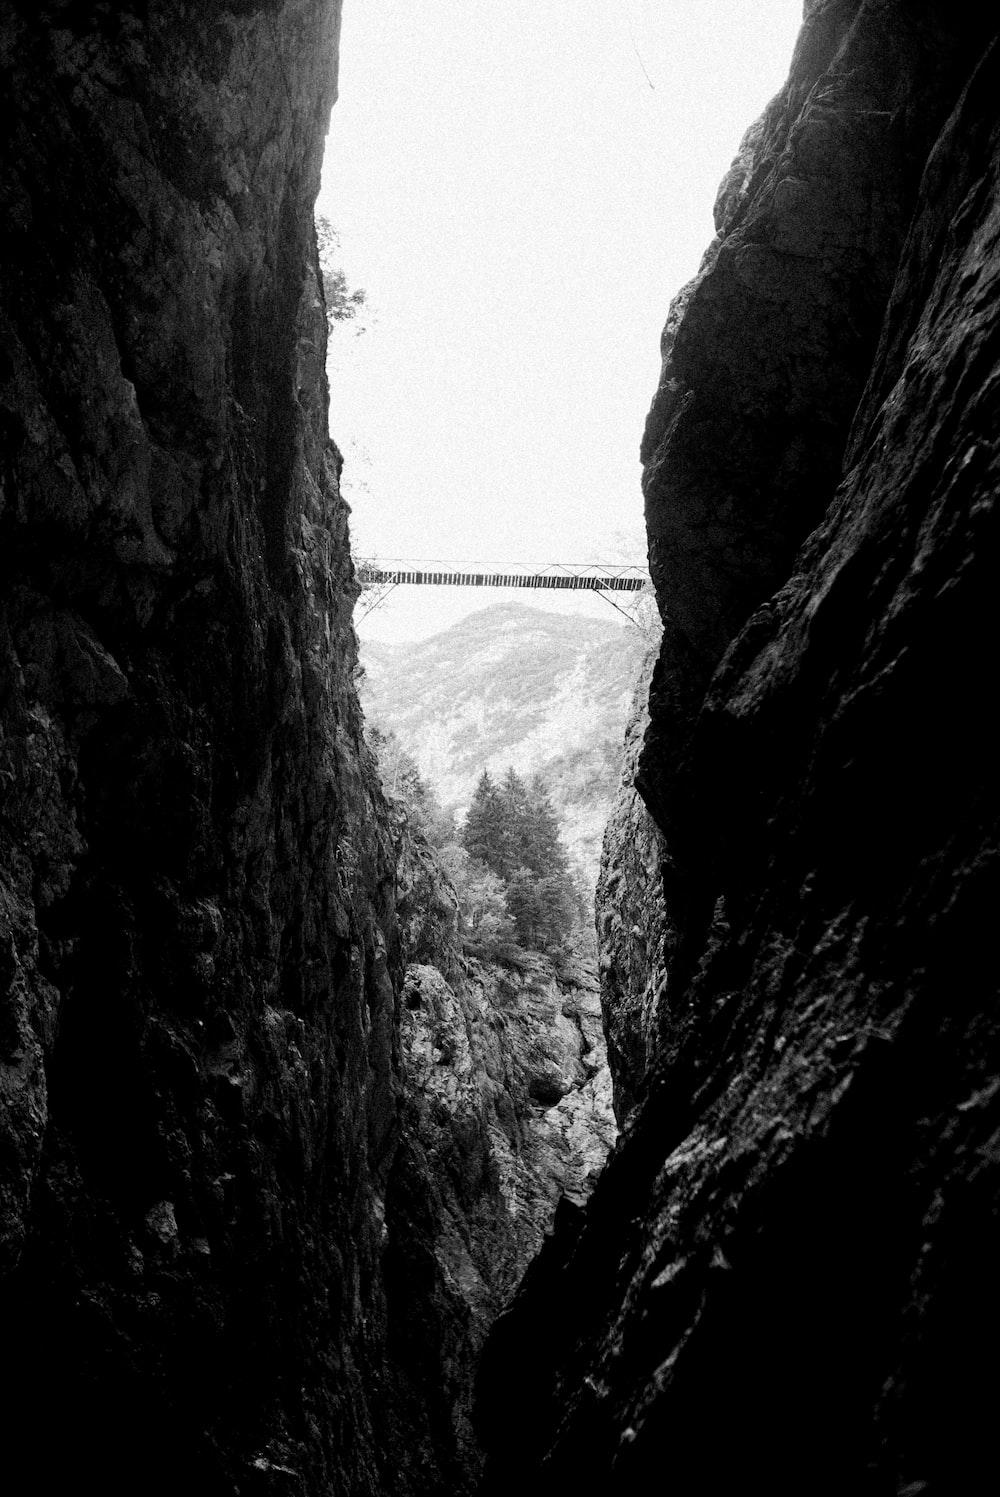 grayscale photo of bridge between rock formation